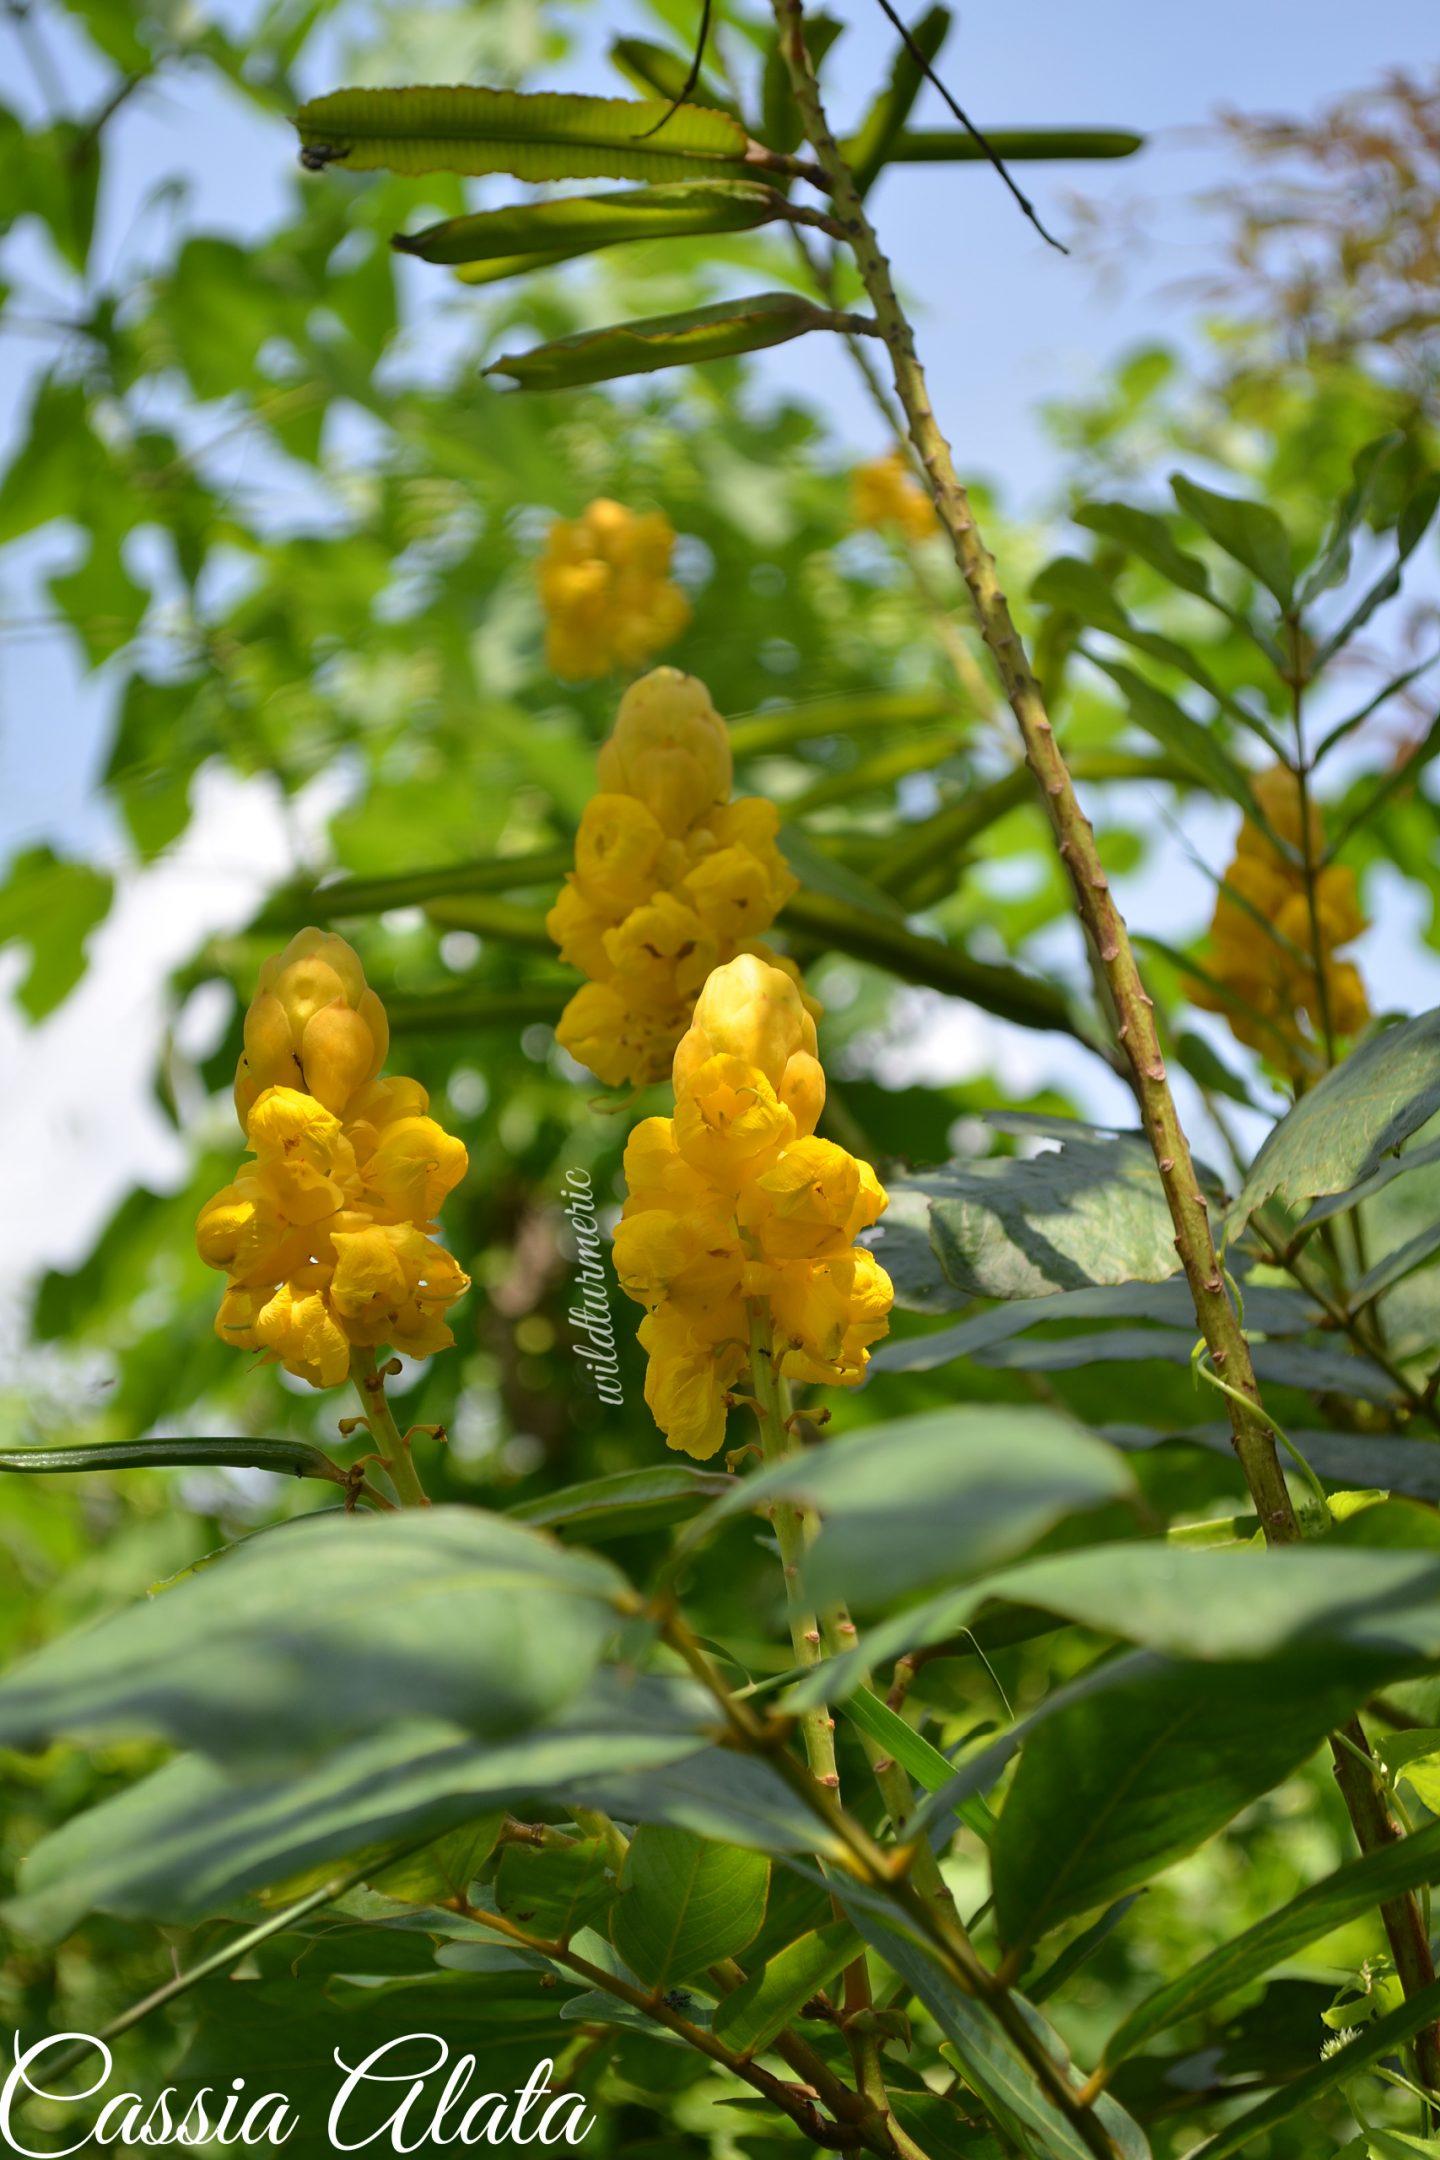 cassia alata tree medicinal uses